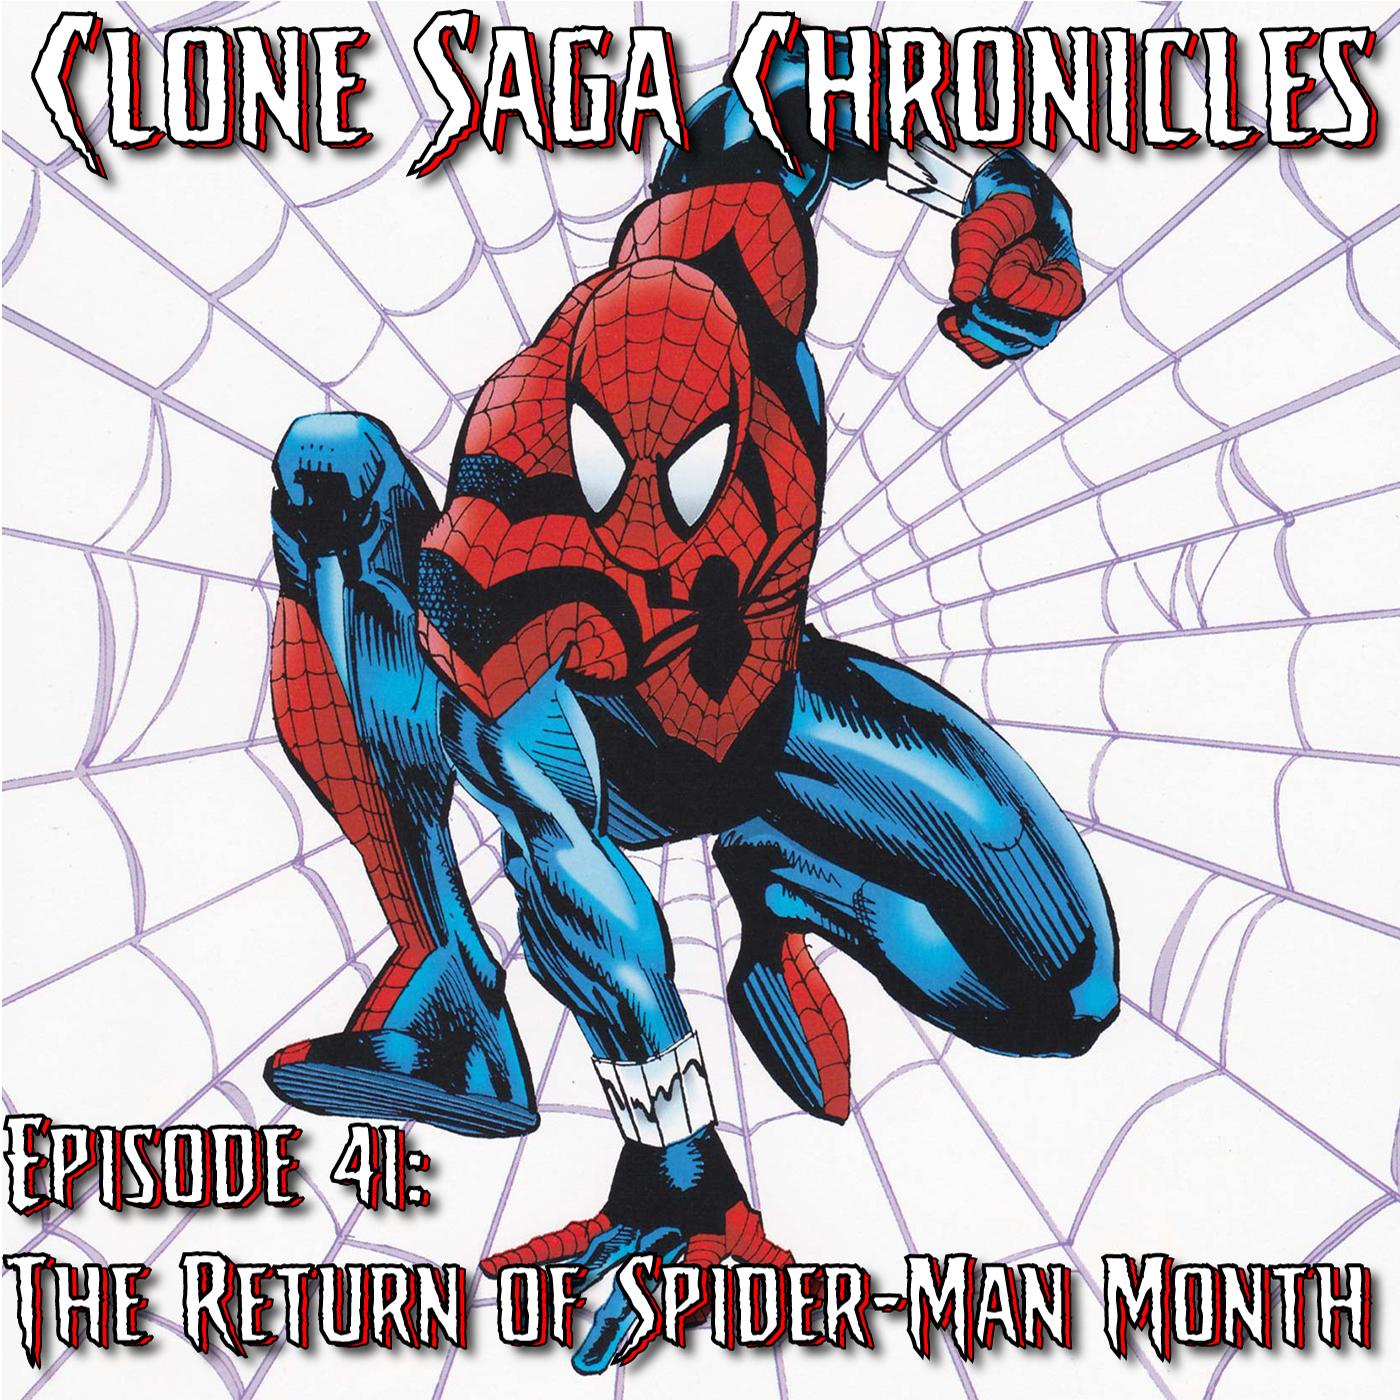 CSC Episode 41: The Return of Spider-Man (Jan/Feb 1995)